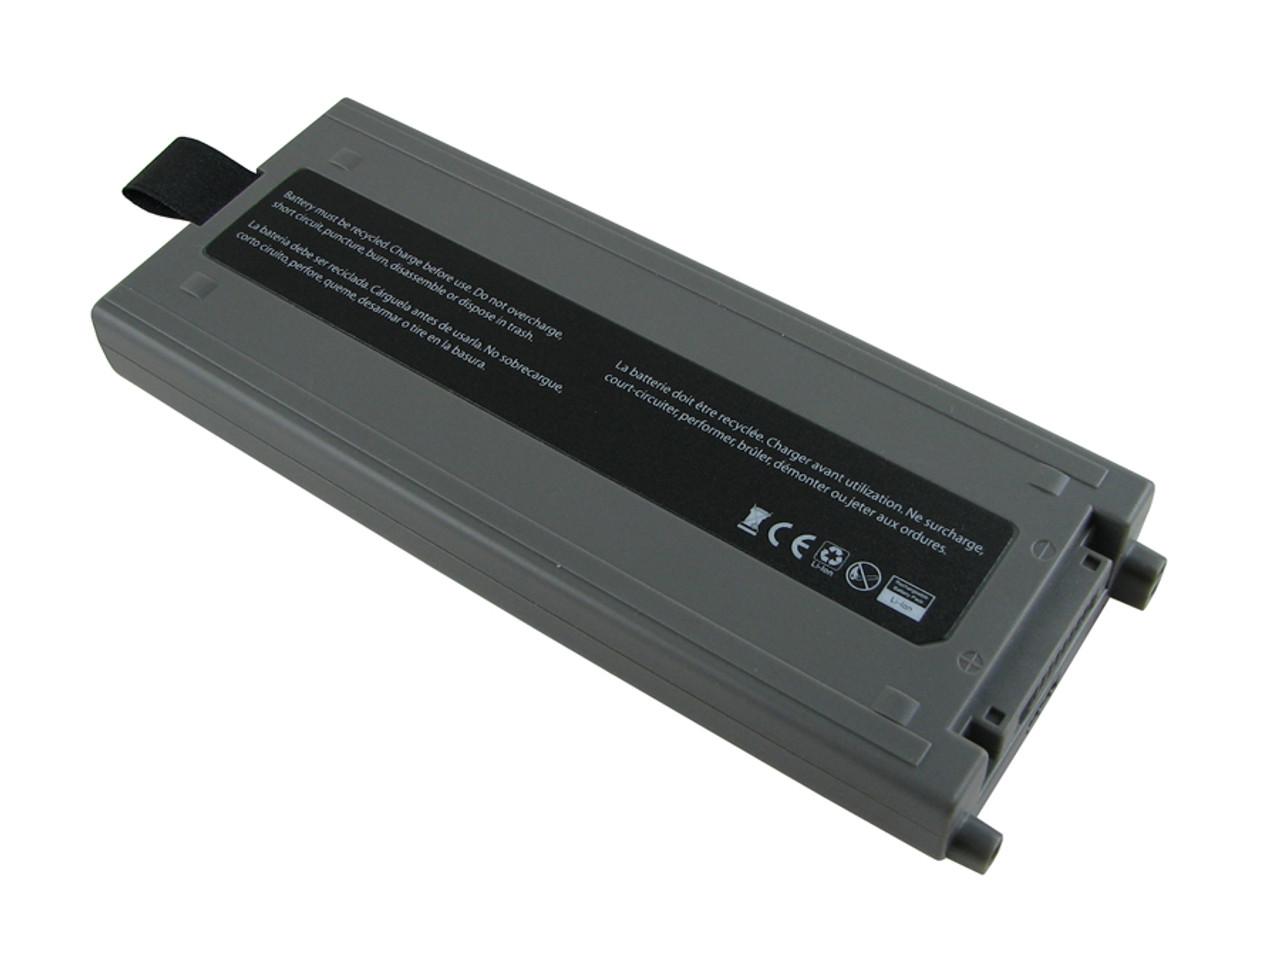 Panasonic ToughBook 19 CF-19 battery